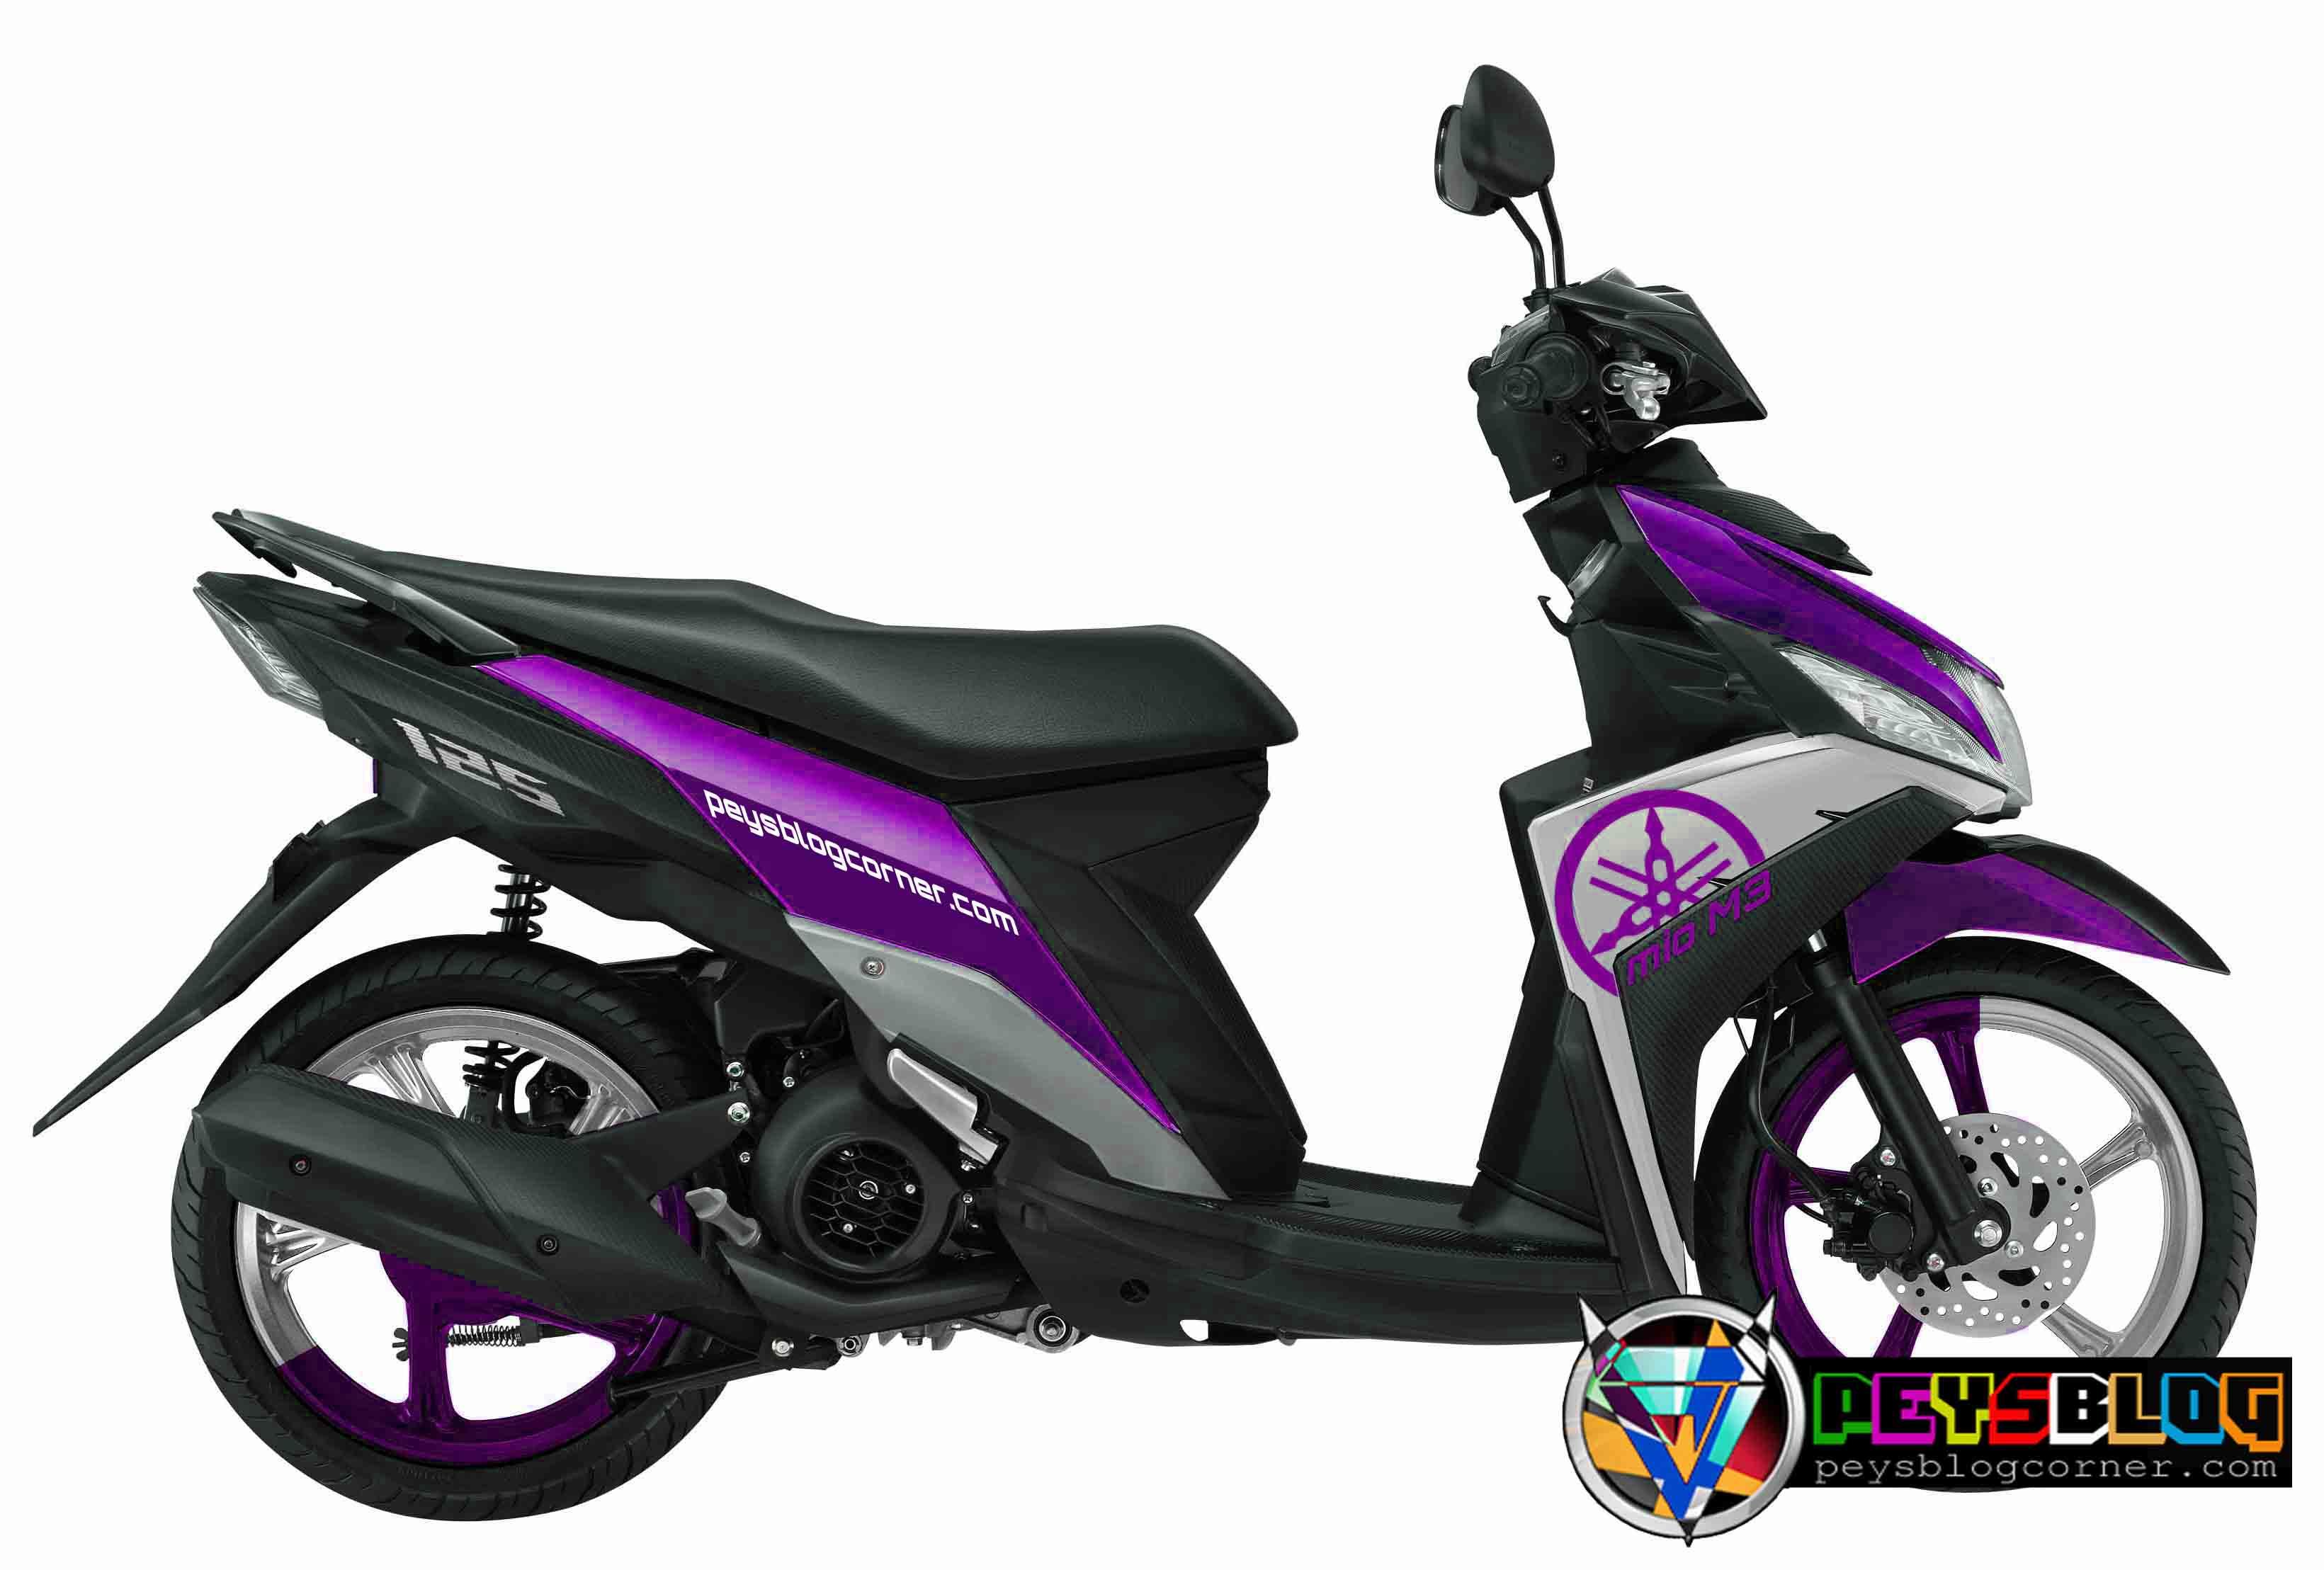 20 Kumpulan Modifikasi Motor Mio J Warna Ungu Terlengkap